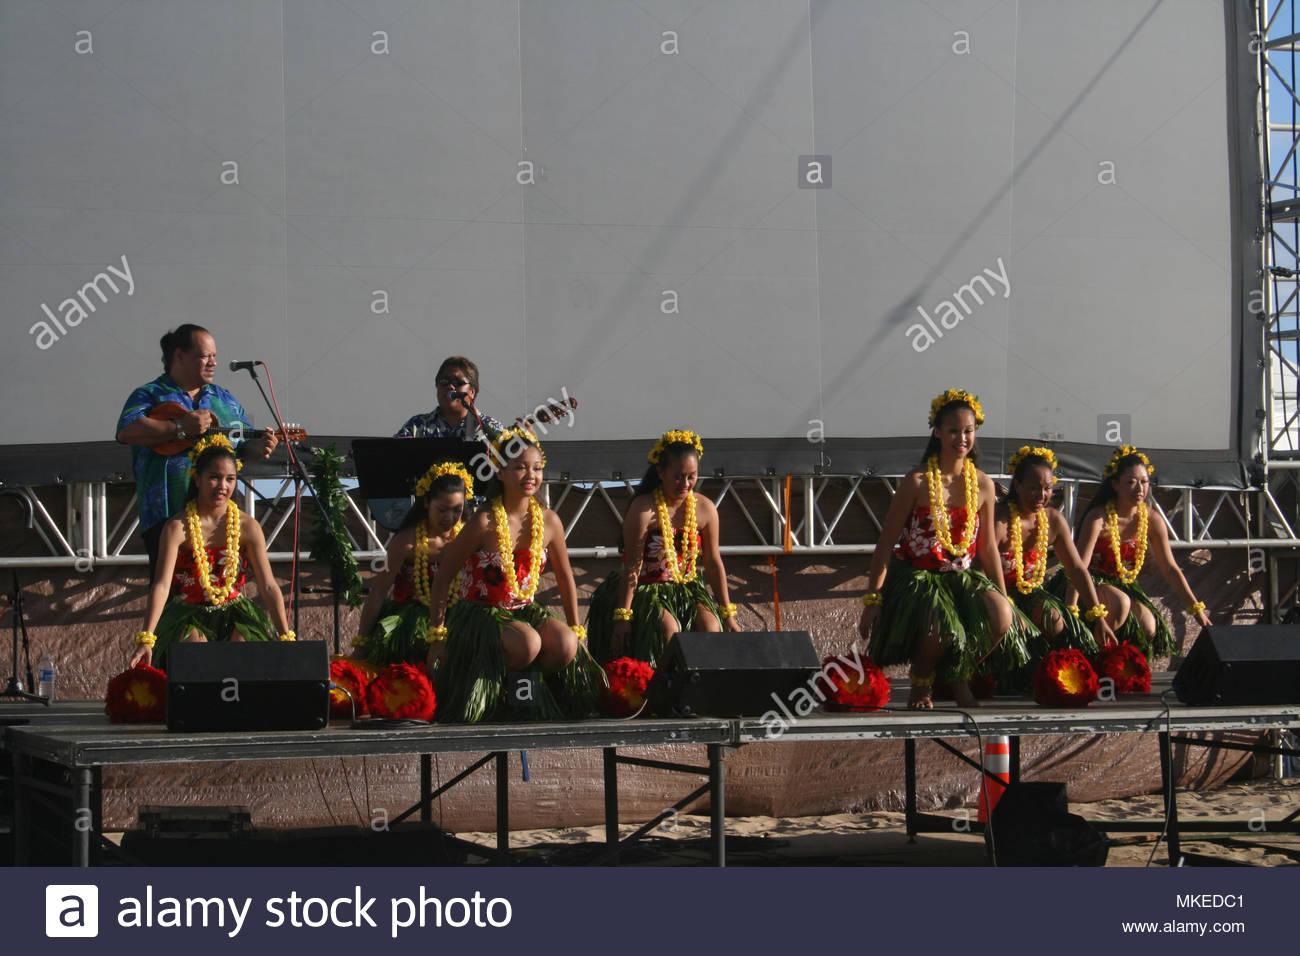 Hula dancers perform on the Hawaiian island of Oahu, USA. - Stock Image